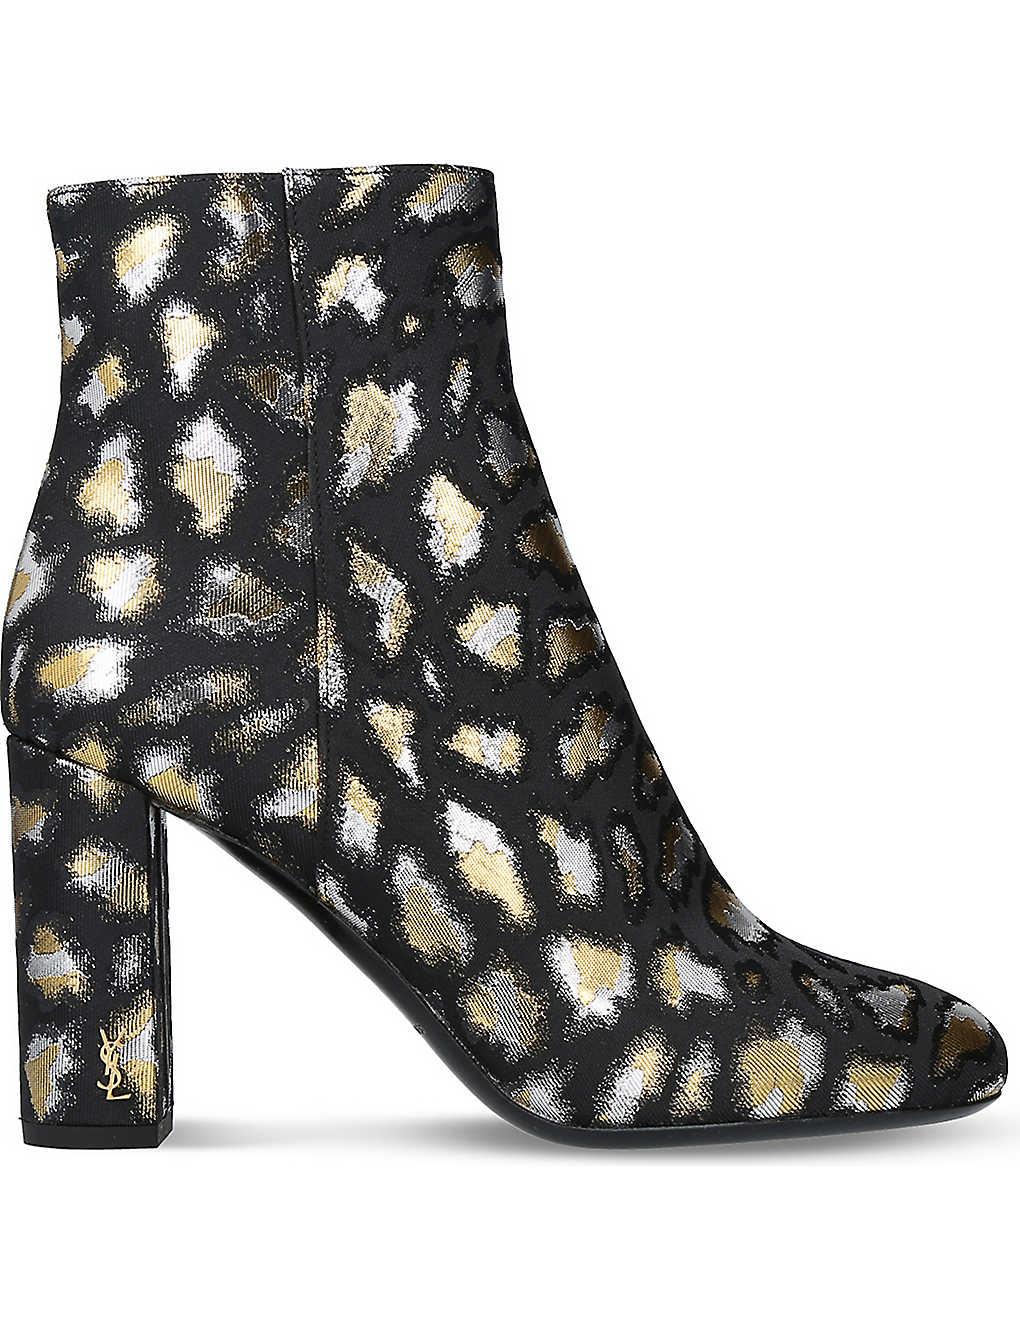 06b6bf59512 SAINT LAURENT - Loulou metallic ankle boots   Selfridges.com